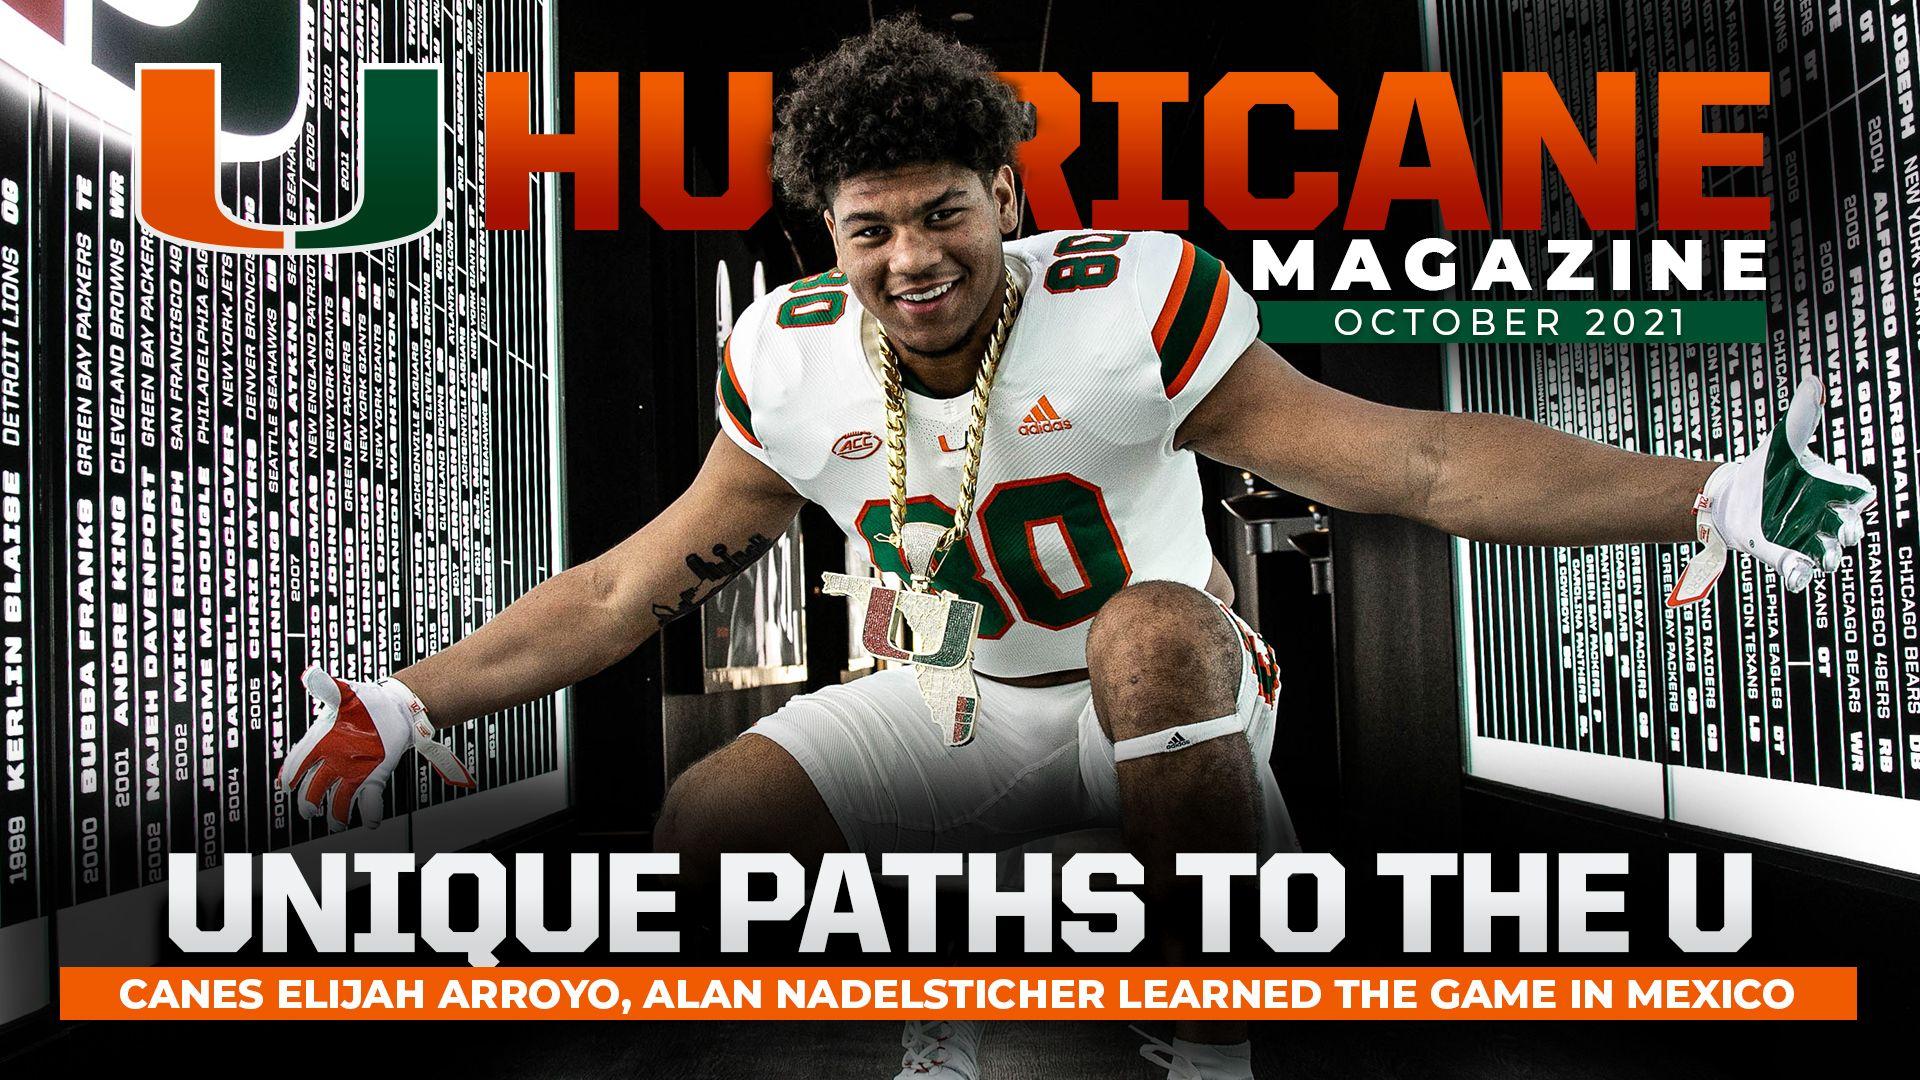 Hurricane Magazine: October 2021